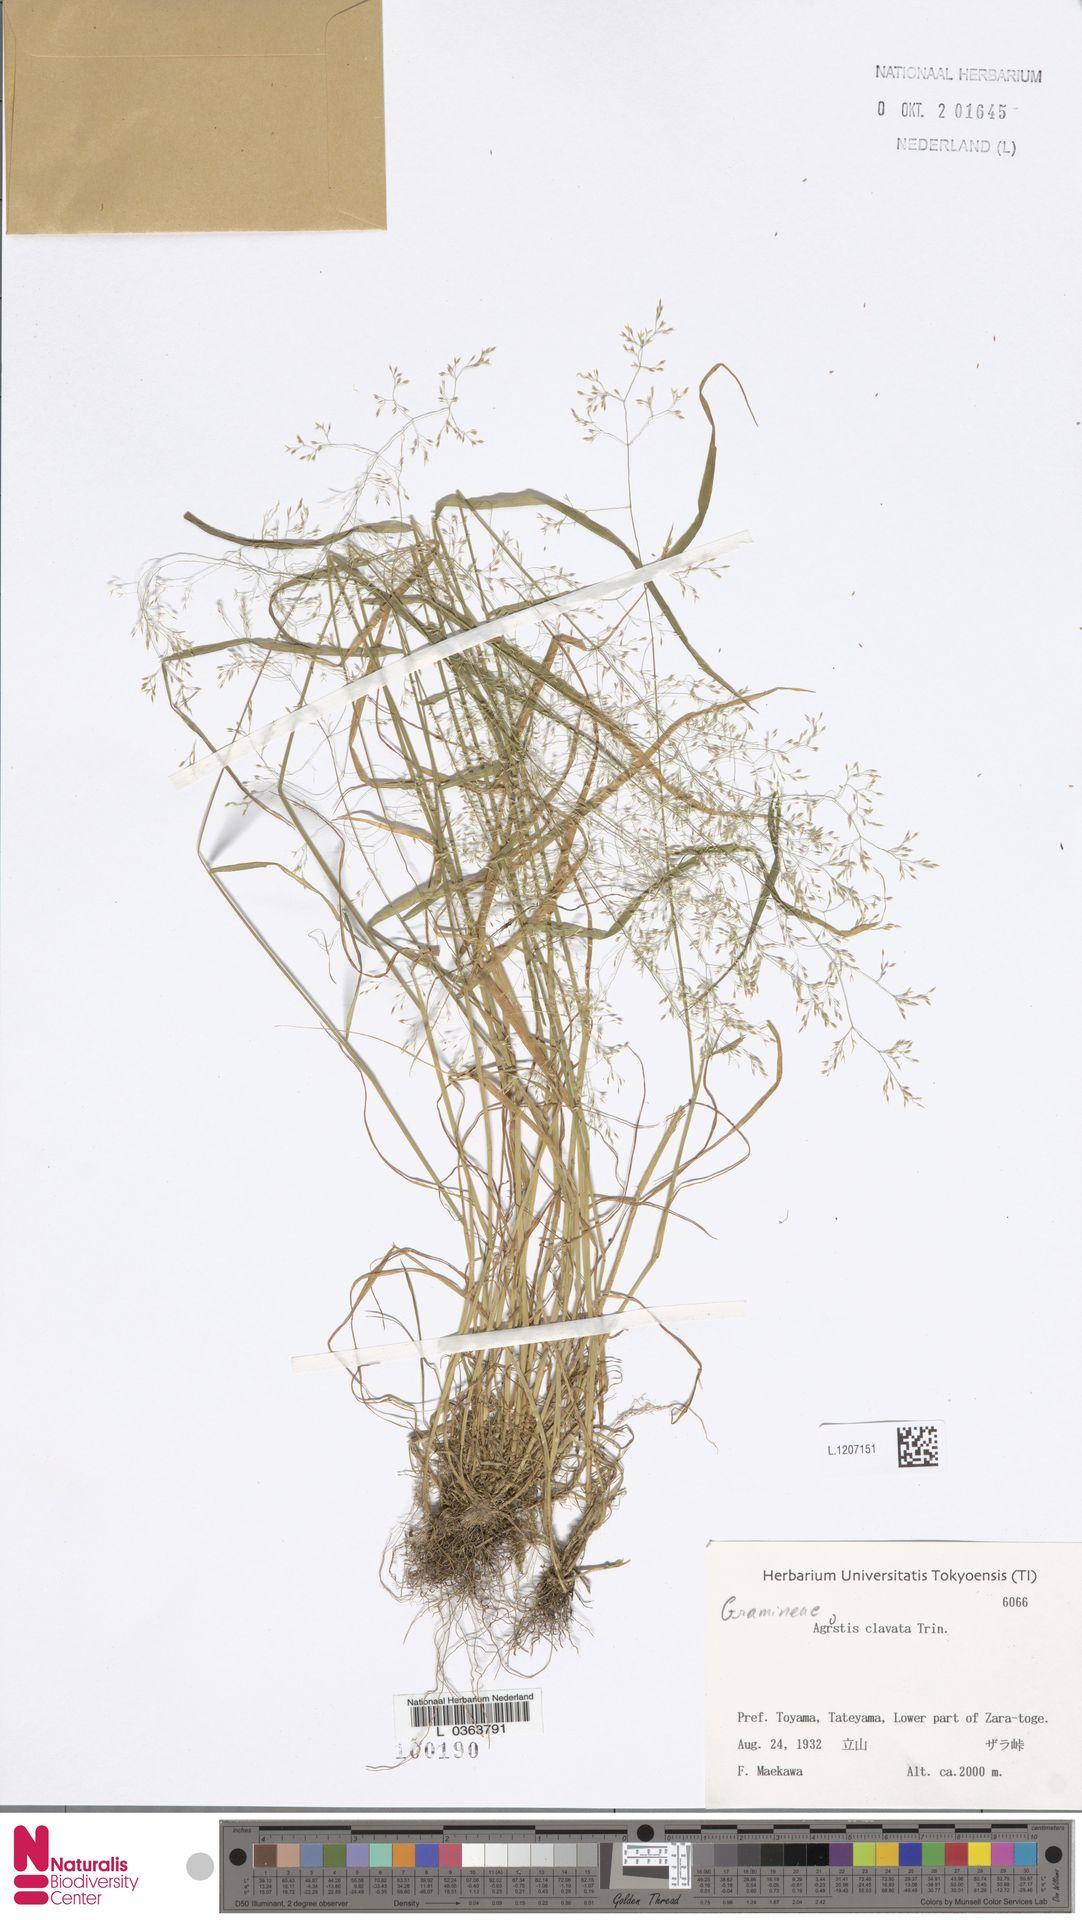 L.1207151   Agrostis clavata Trin.